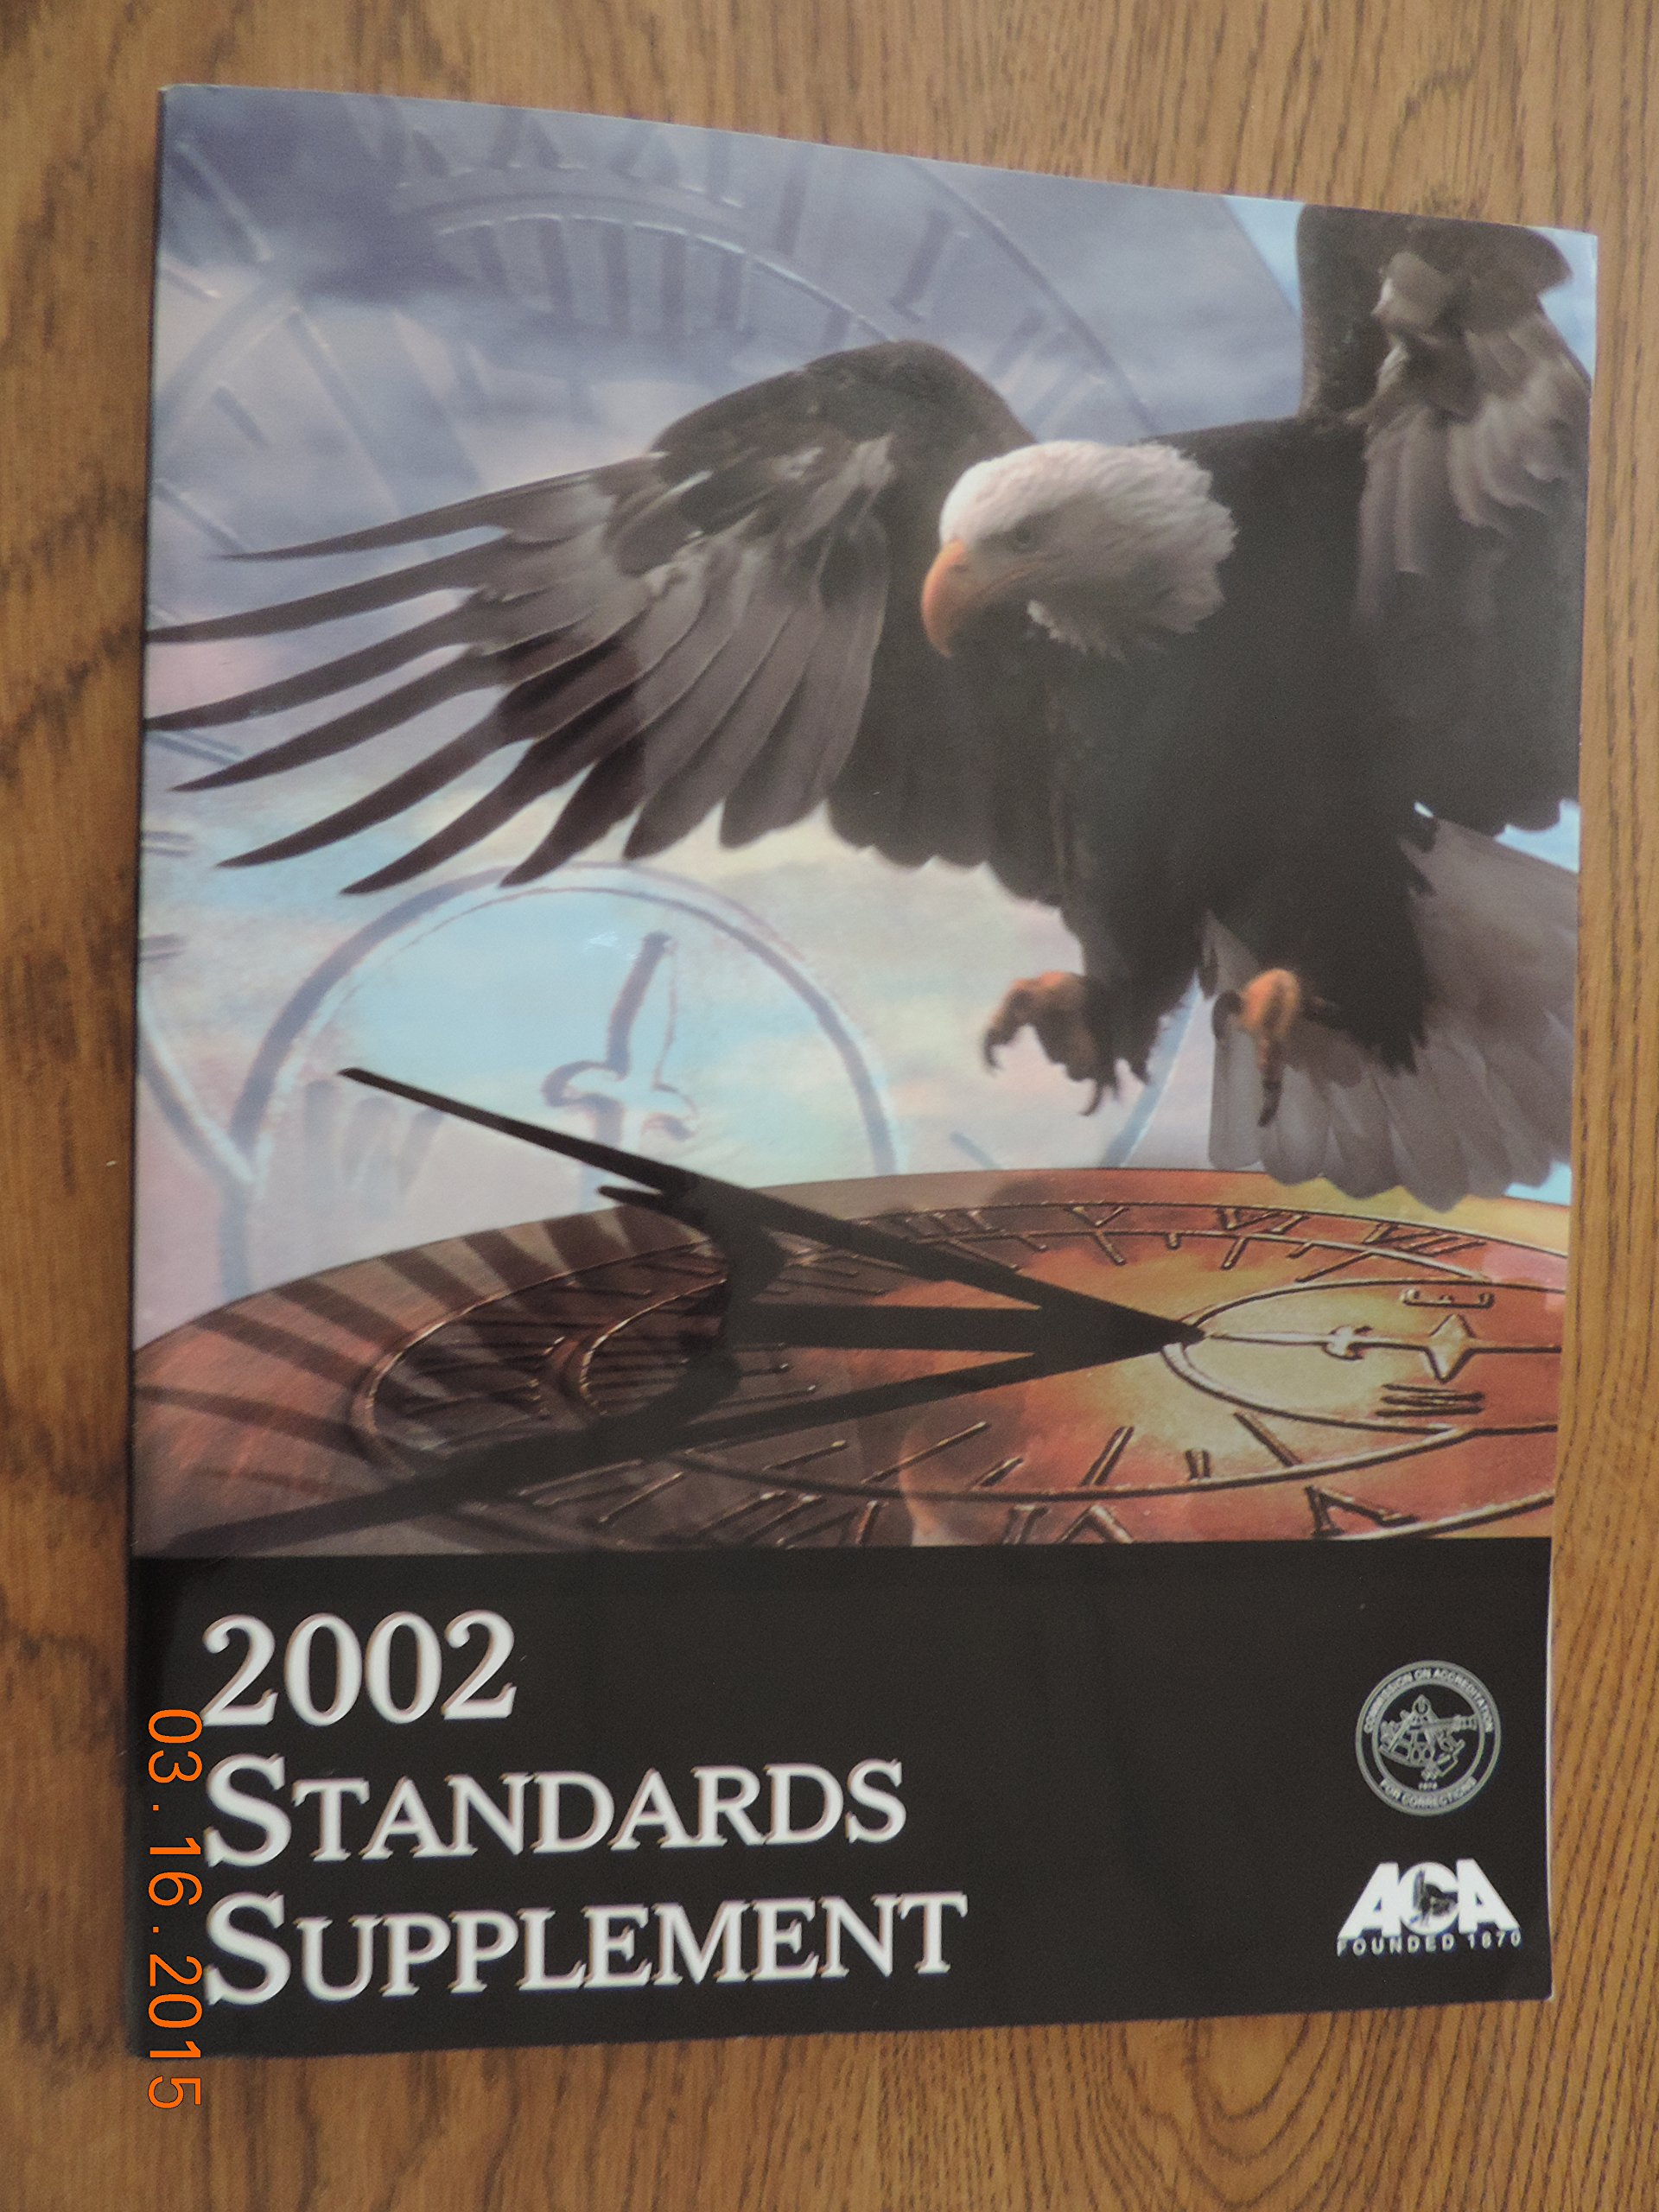 2002 Standards Supplement (STANDARDS SUPPLEMENTS) ebook